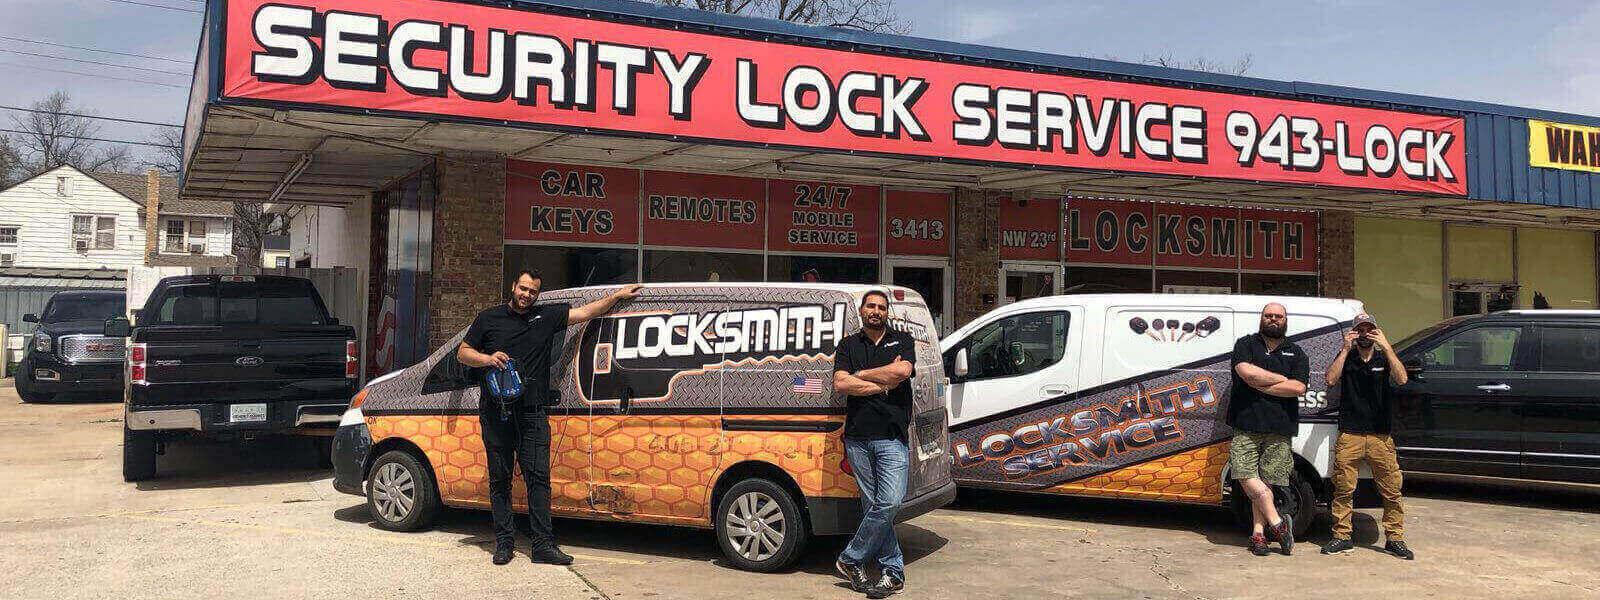 Locksmith OKC - Locksmith Oklahoma City OK   Security Lock